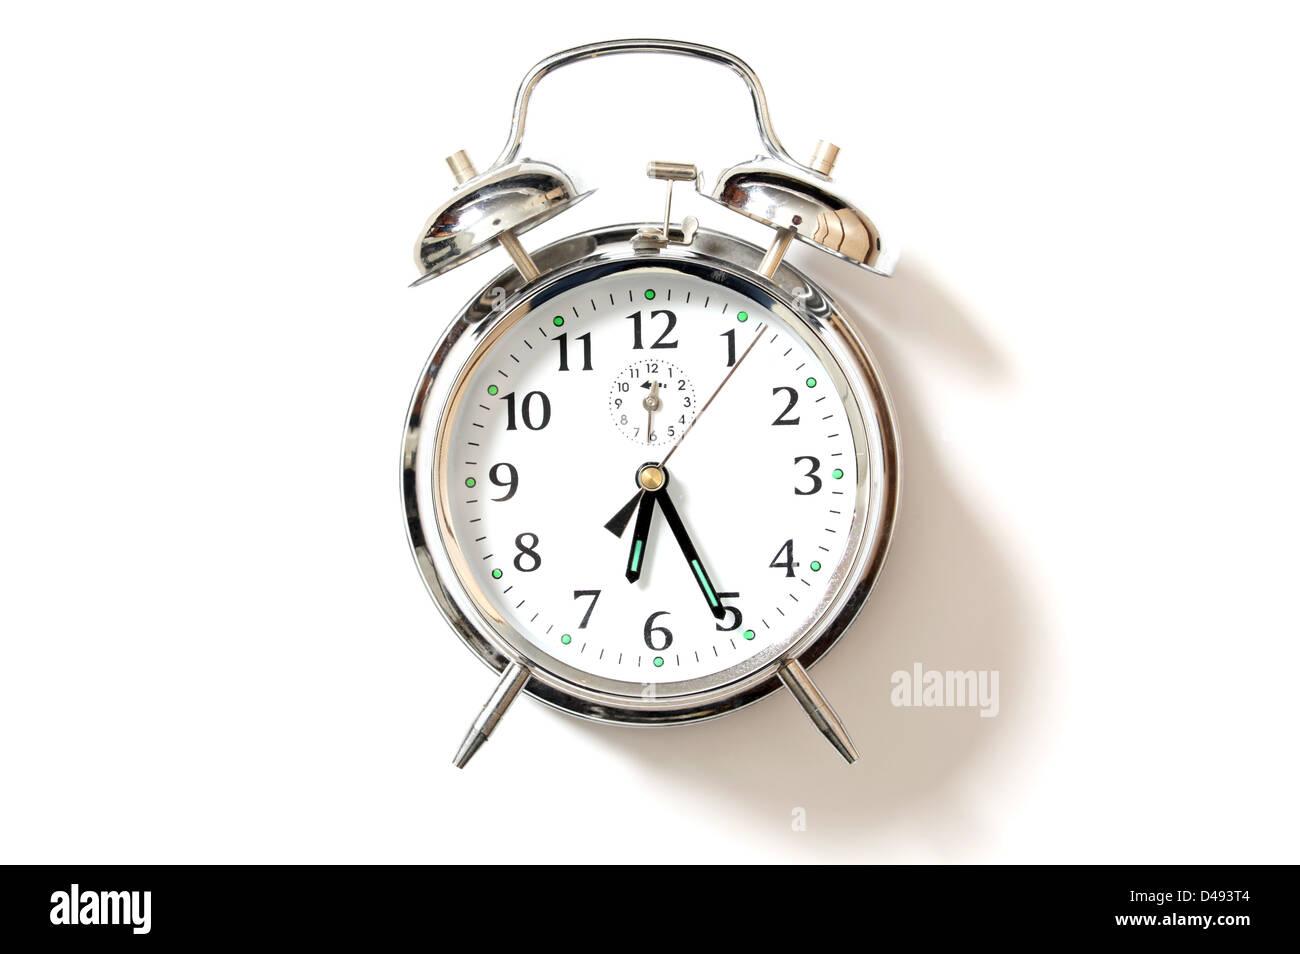 New Alarm Clock 6 30 Am - SOMKOME